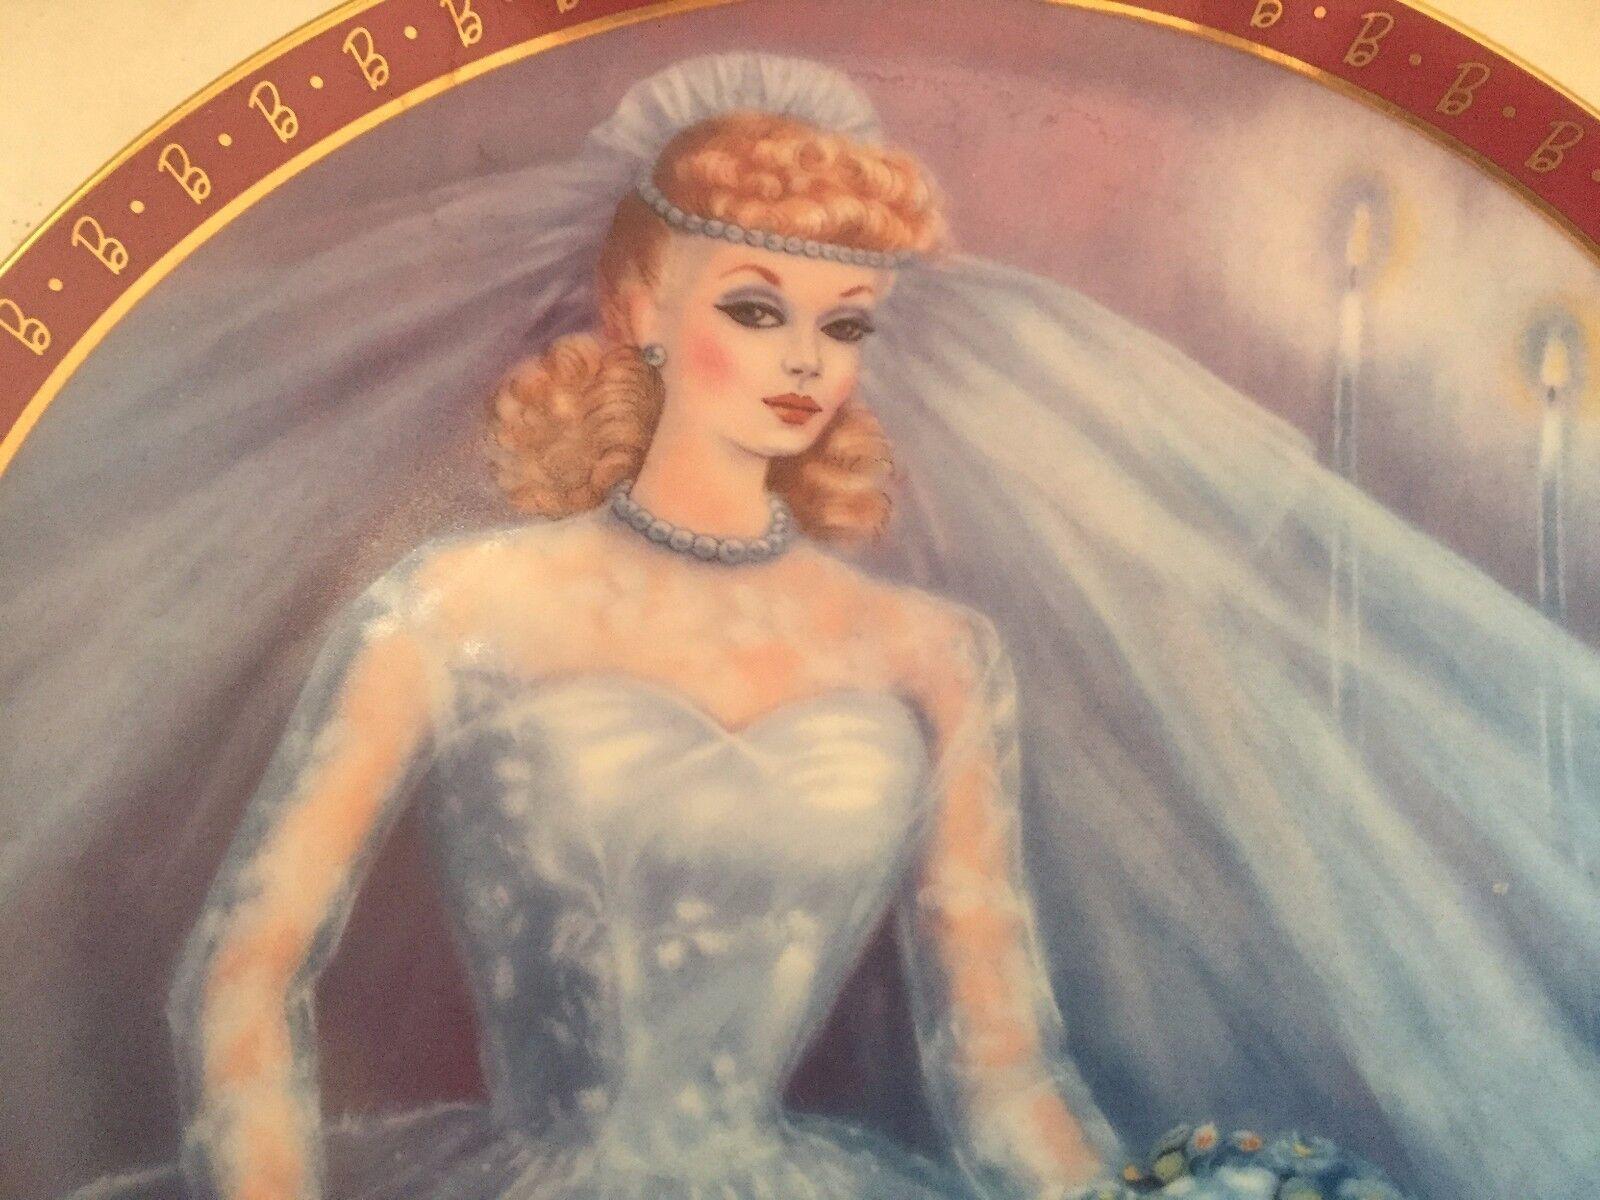 1959 Barbie Bride To Be Susie Morton High Fashion Collector Plate Danbury Mint - $2.81